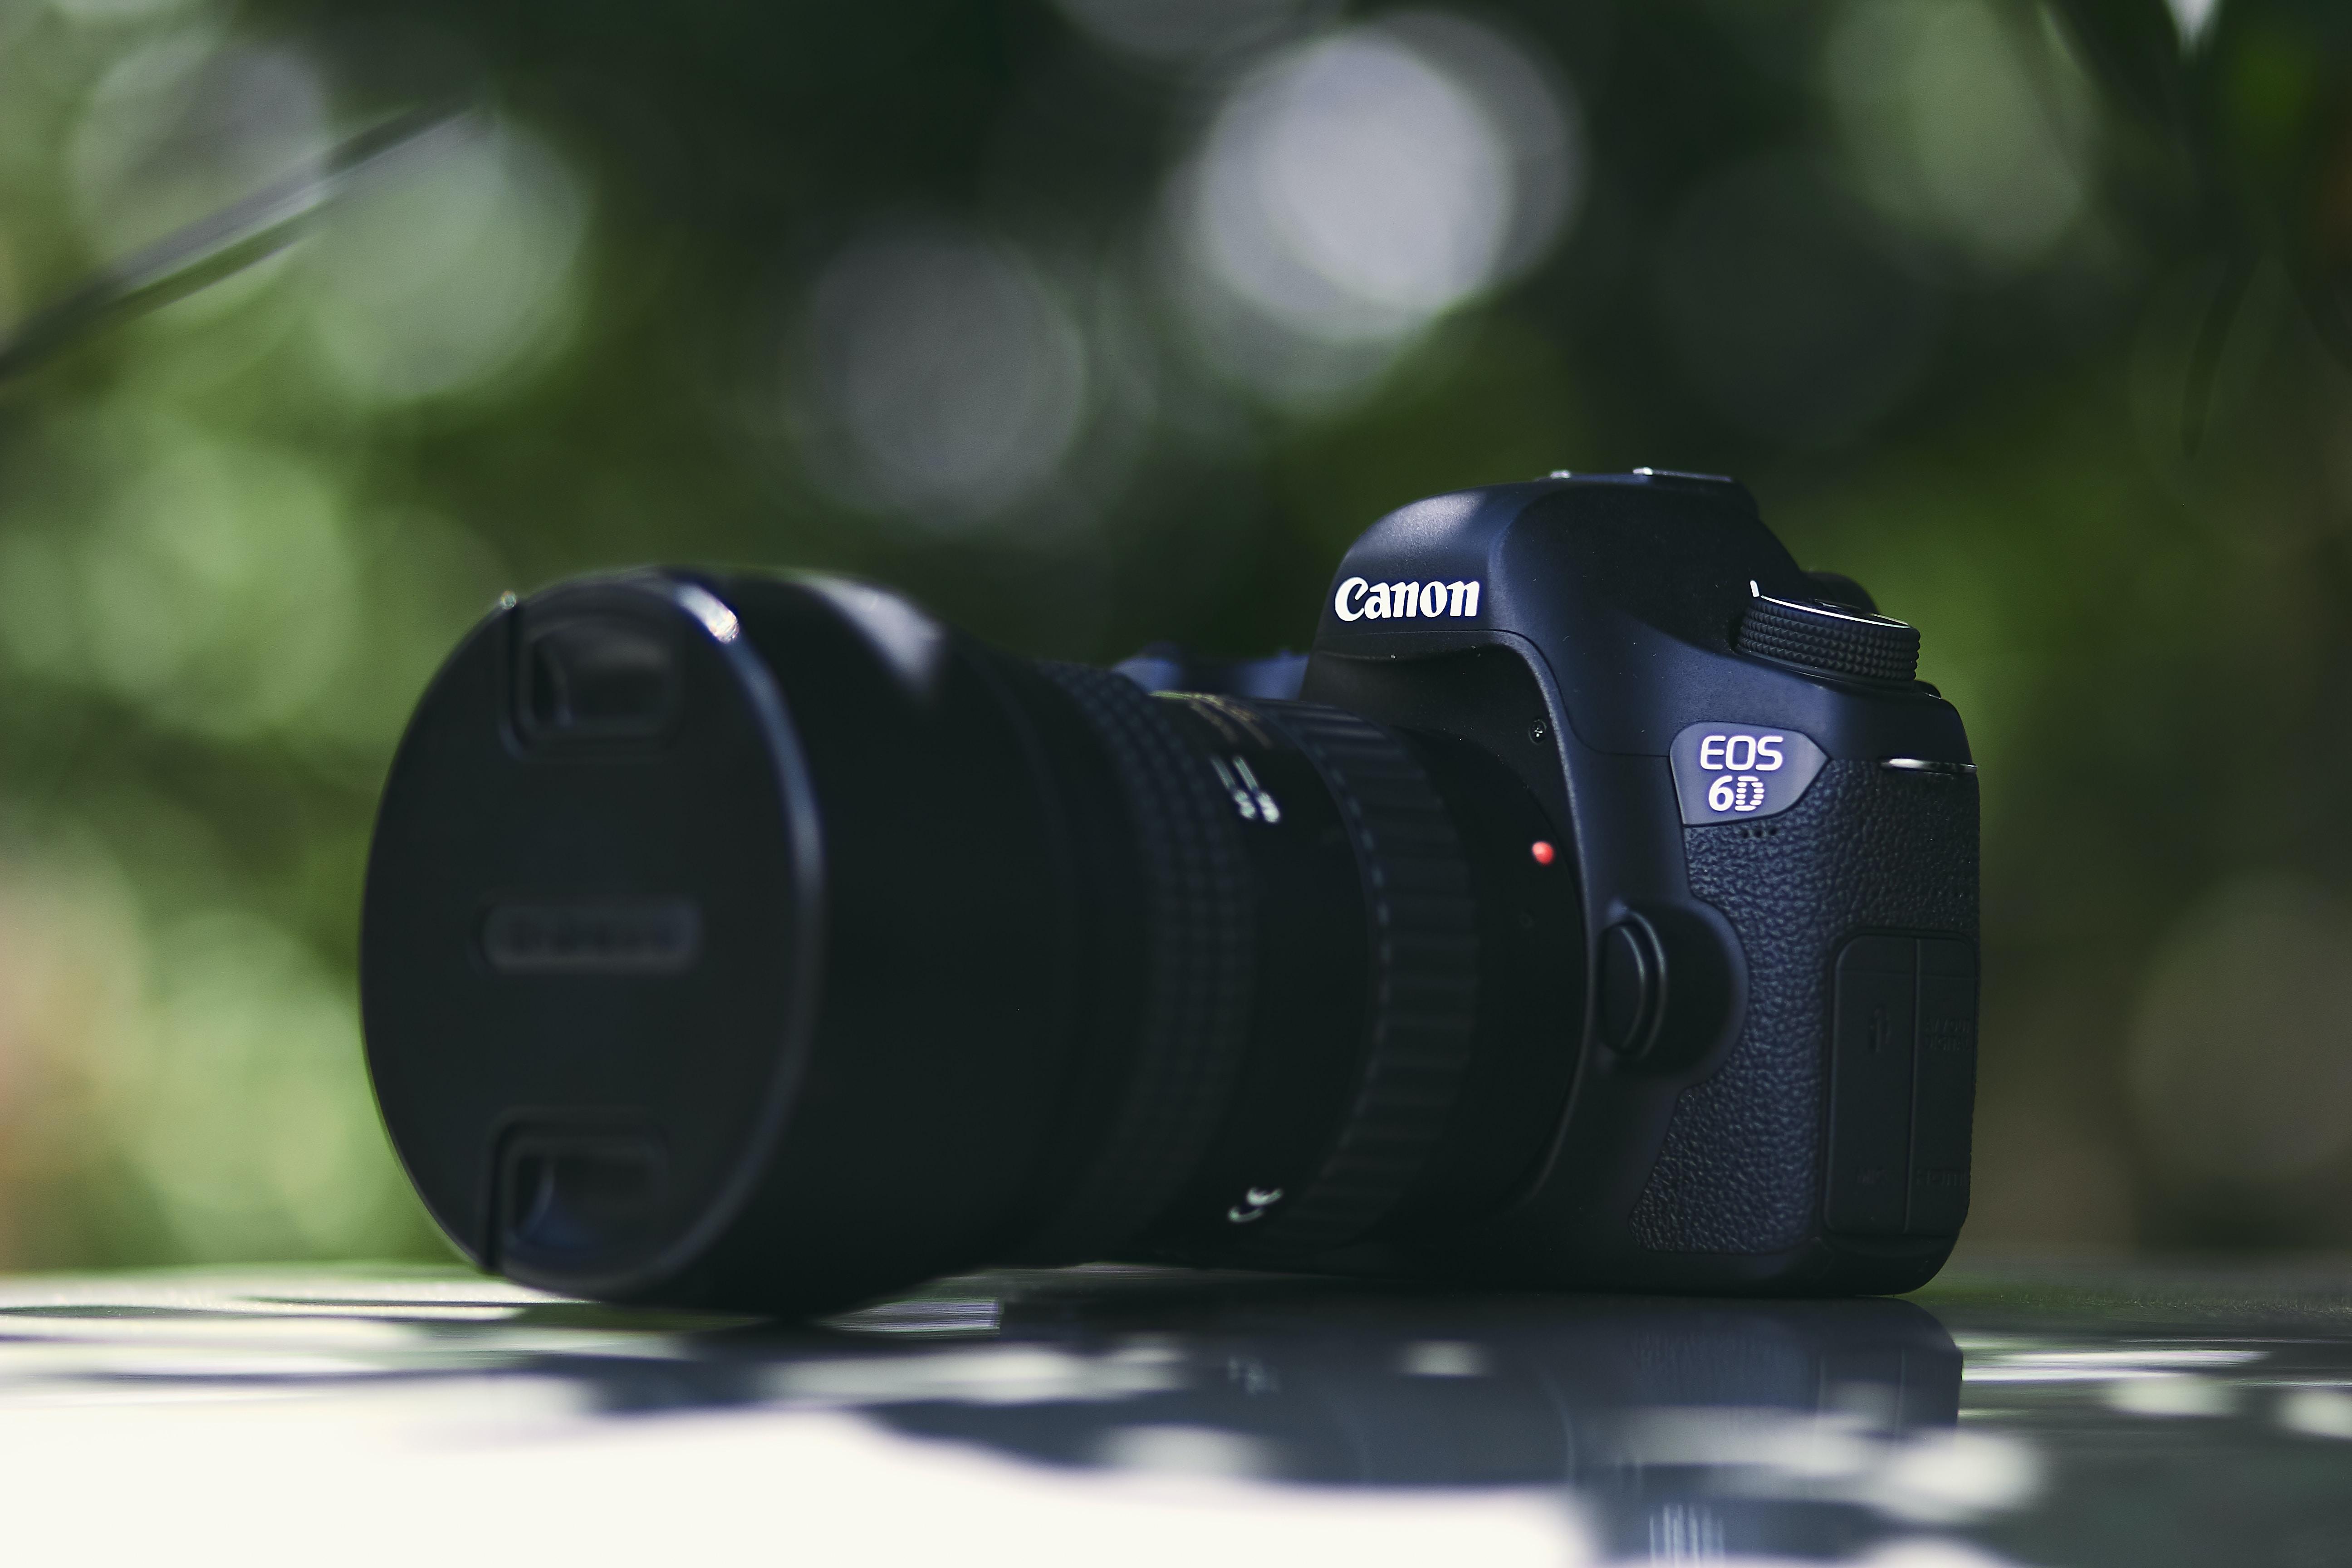 black Canon EOS 6D DSLR camera on white surface